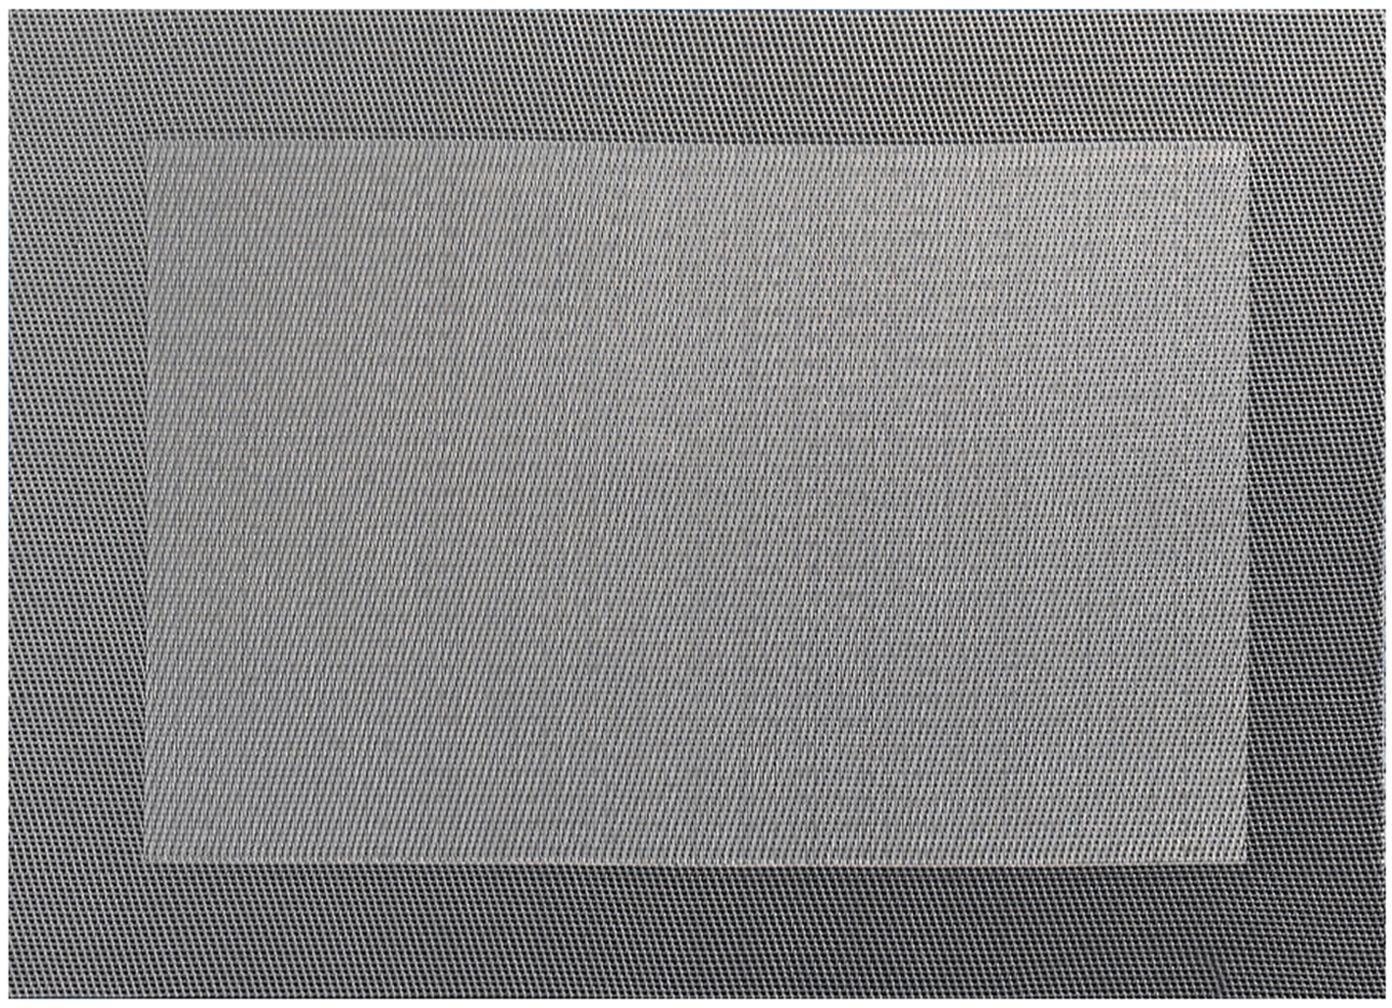 Kunststoff-Tischsets Trefl, 2 Stück, Kunststoff (PVC), Grautöne, 33 x 46 cm